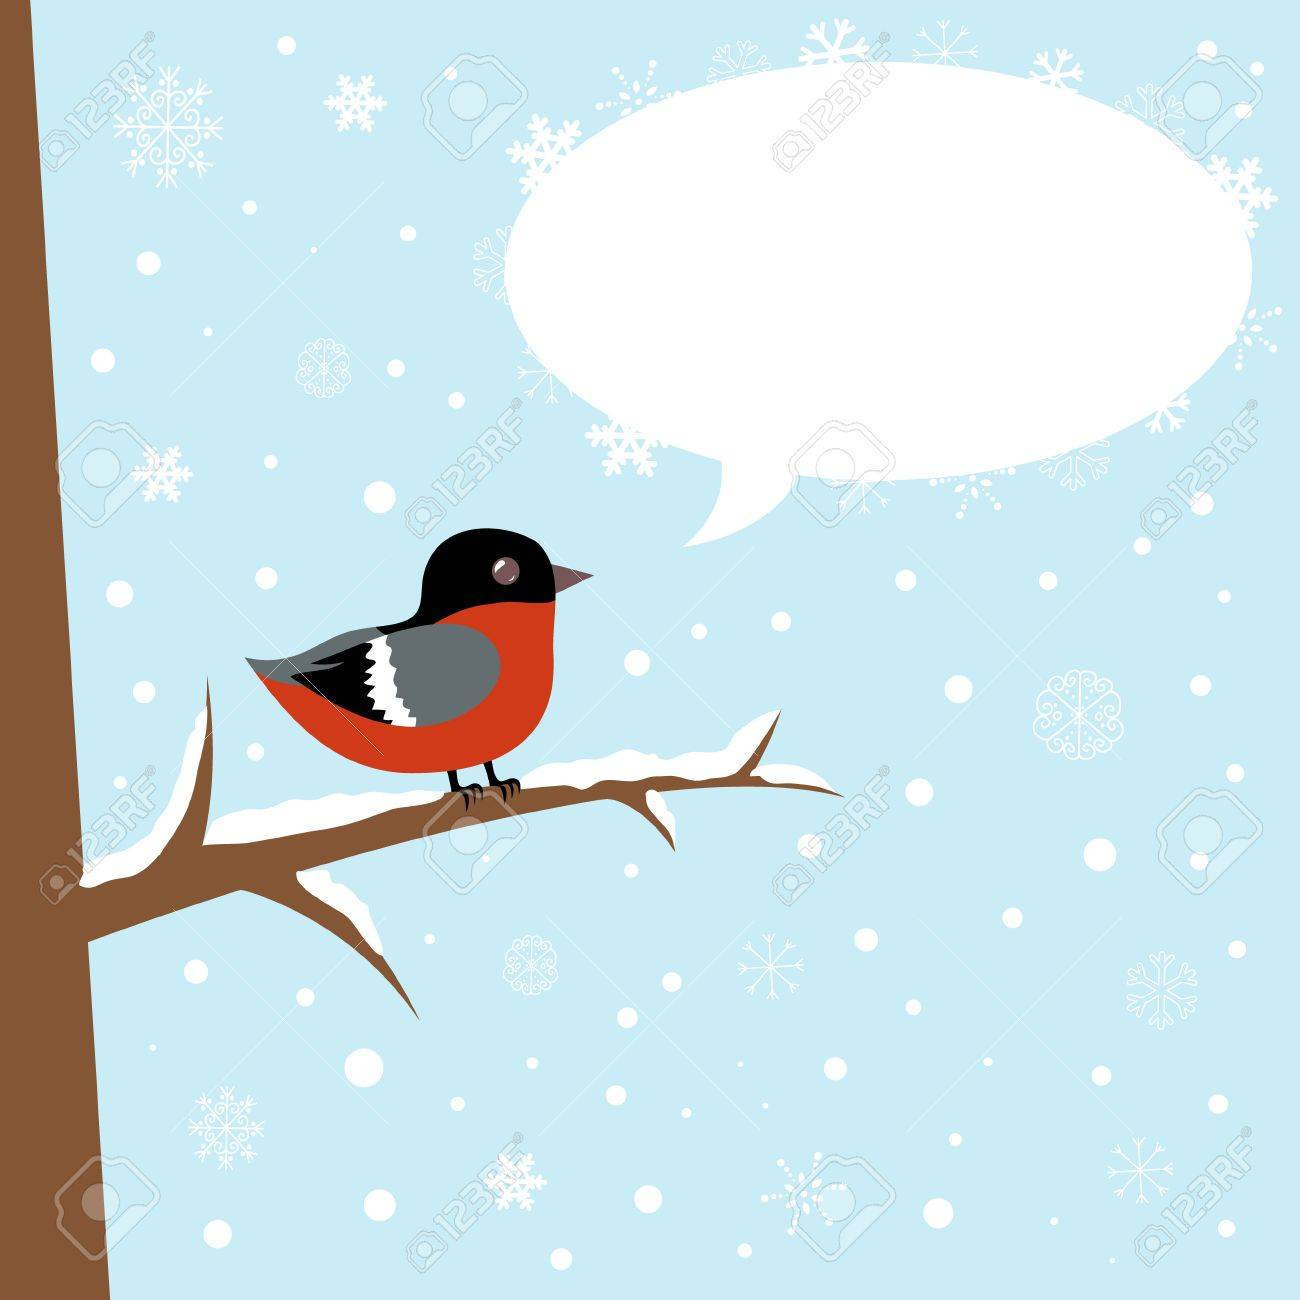 Cute winter bullfinch bird sitting on a branch with speech bubble Stock Vector - 16234172